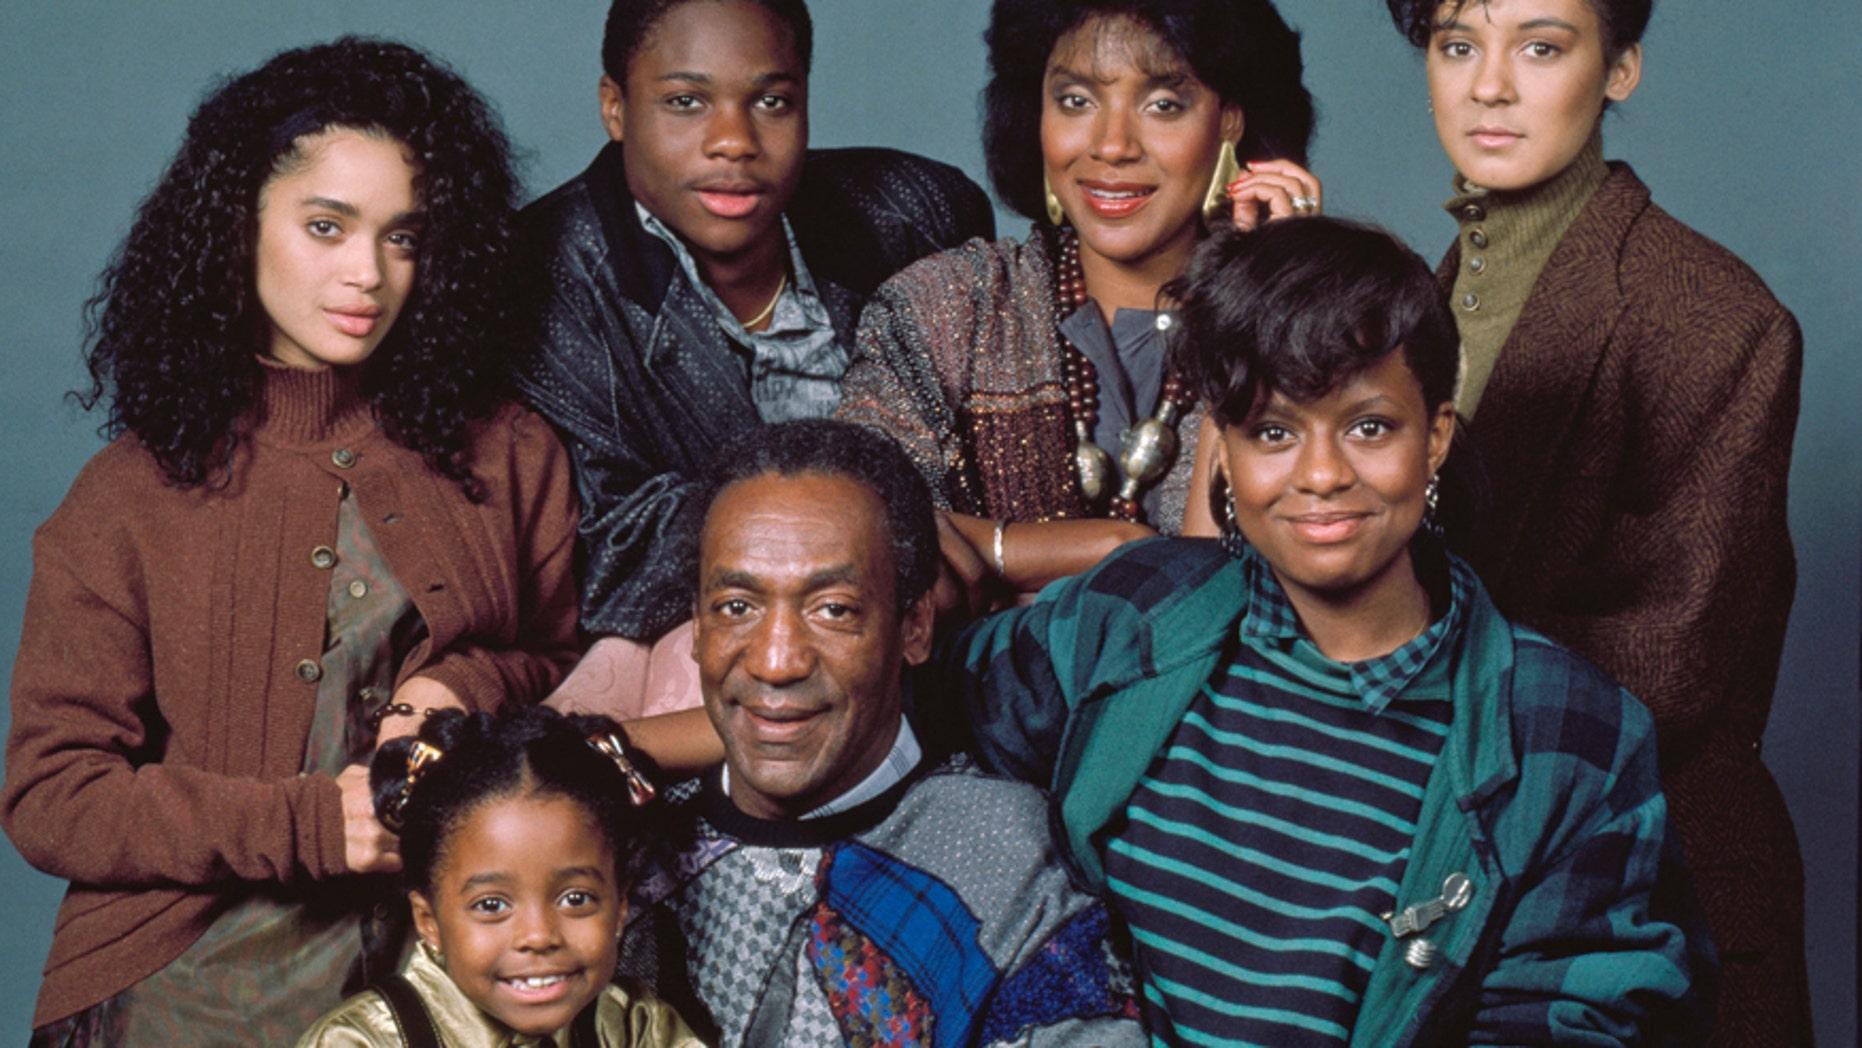 Pictured: (back row, l-r) Lisa Bonet as Denise Huxtable, Malcolm-Jamal Warner as Theodore 'Theo' Huxtable, Phylicia Rashad as Clair Hanks Huxtable, Sabrina Le Beauf as Sondra Huxtable Tibideaux, (front row, l-r) Keshia Knight Pulliam as Rudy Huxtable, Bill Cosby as Dr. Heathcliff 'Cliff' Huxtable, Tempestt Bledsoe as Vanessa Huxtable.